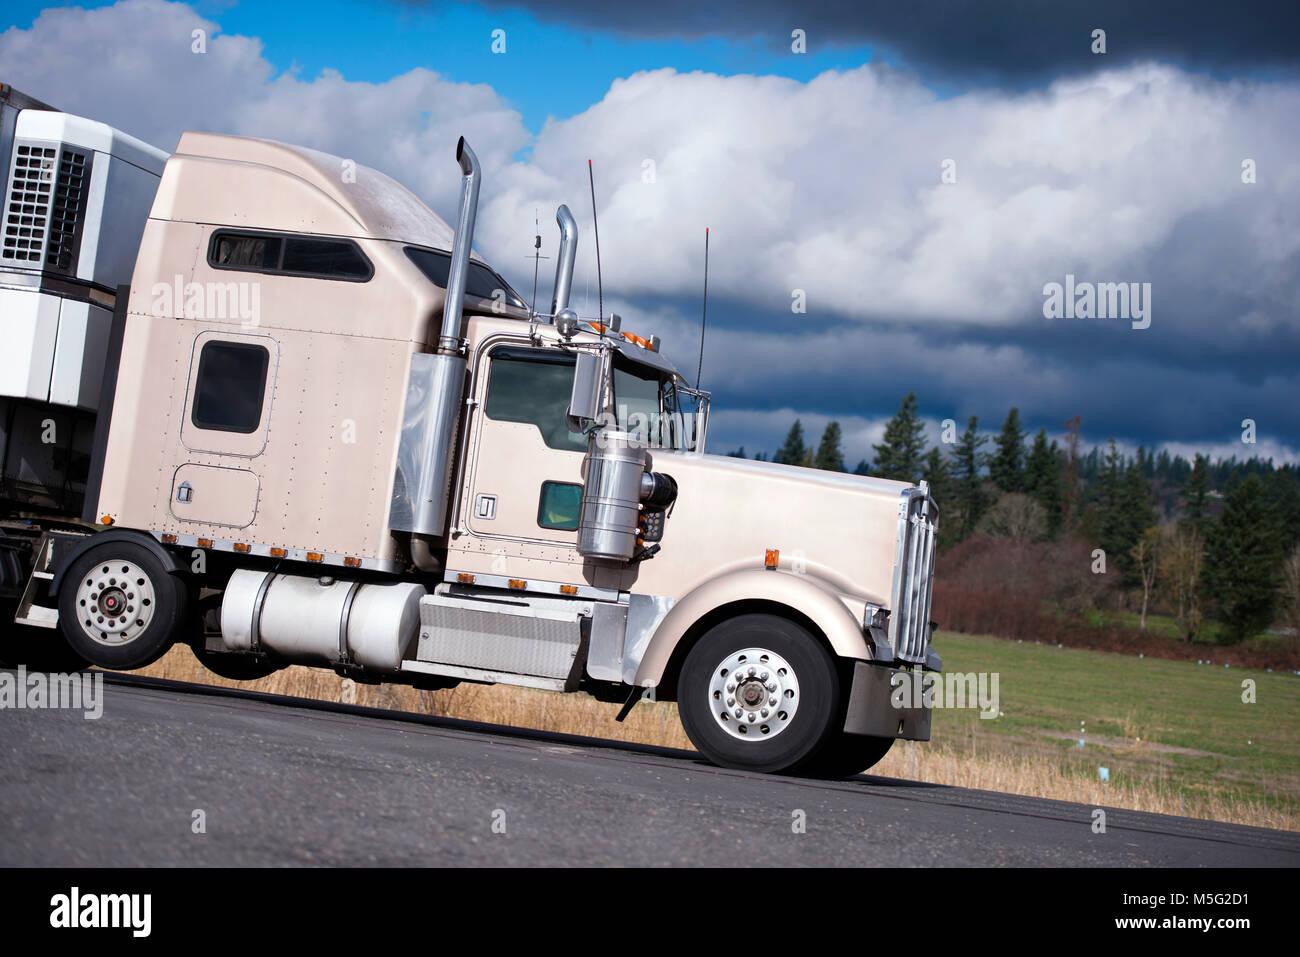 Semi Tractor Accessories : Semi truck lights stock photos